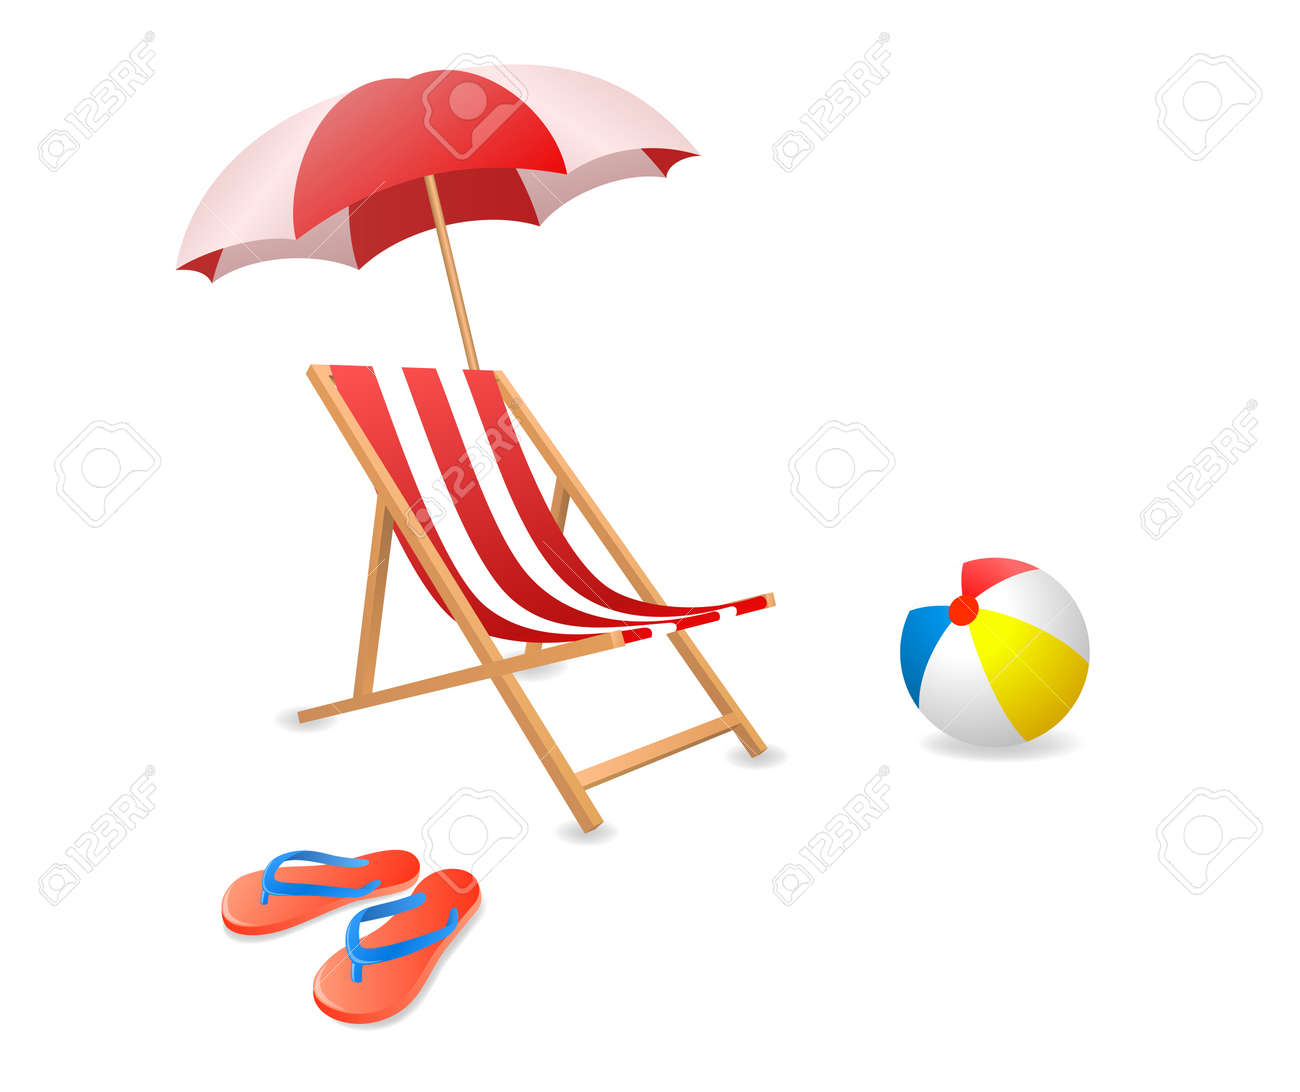 Beach chair and umbrella - Beach Umbrella Vector Illustration Of A Beach Chair With Umbrella